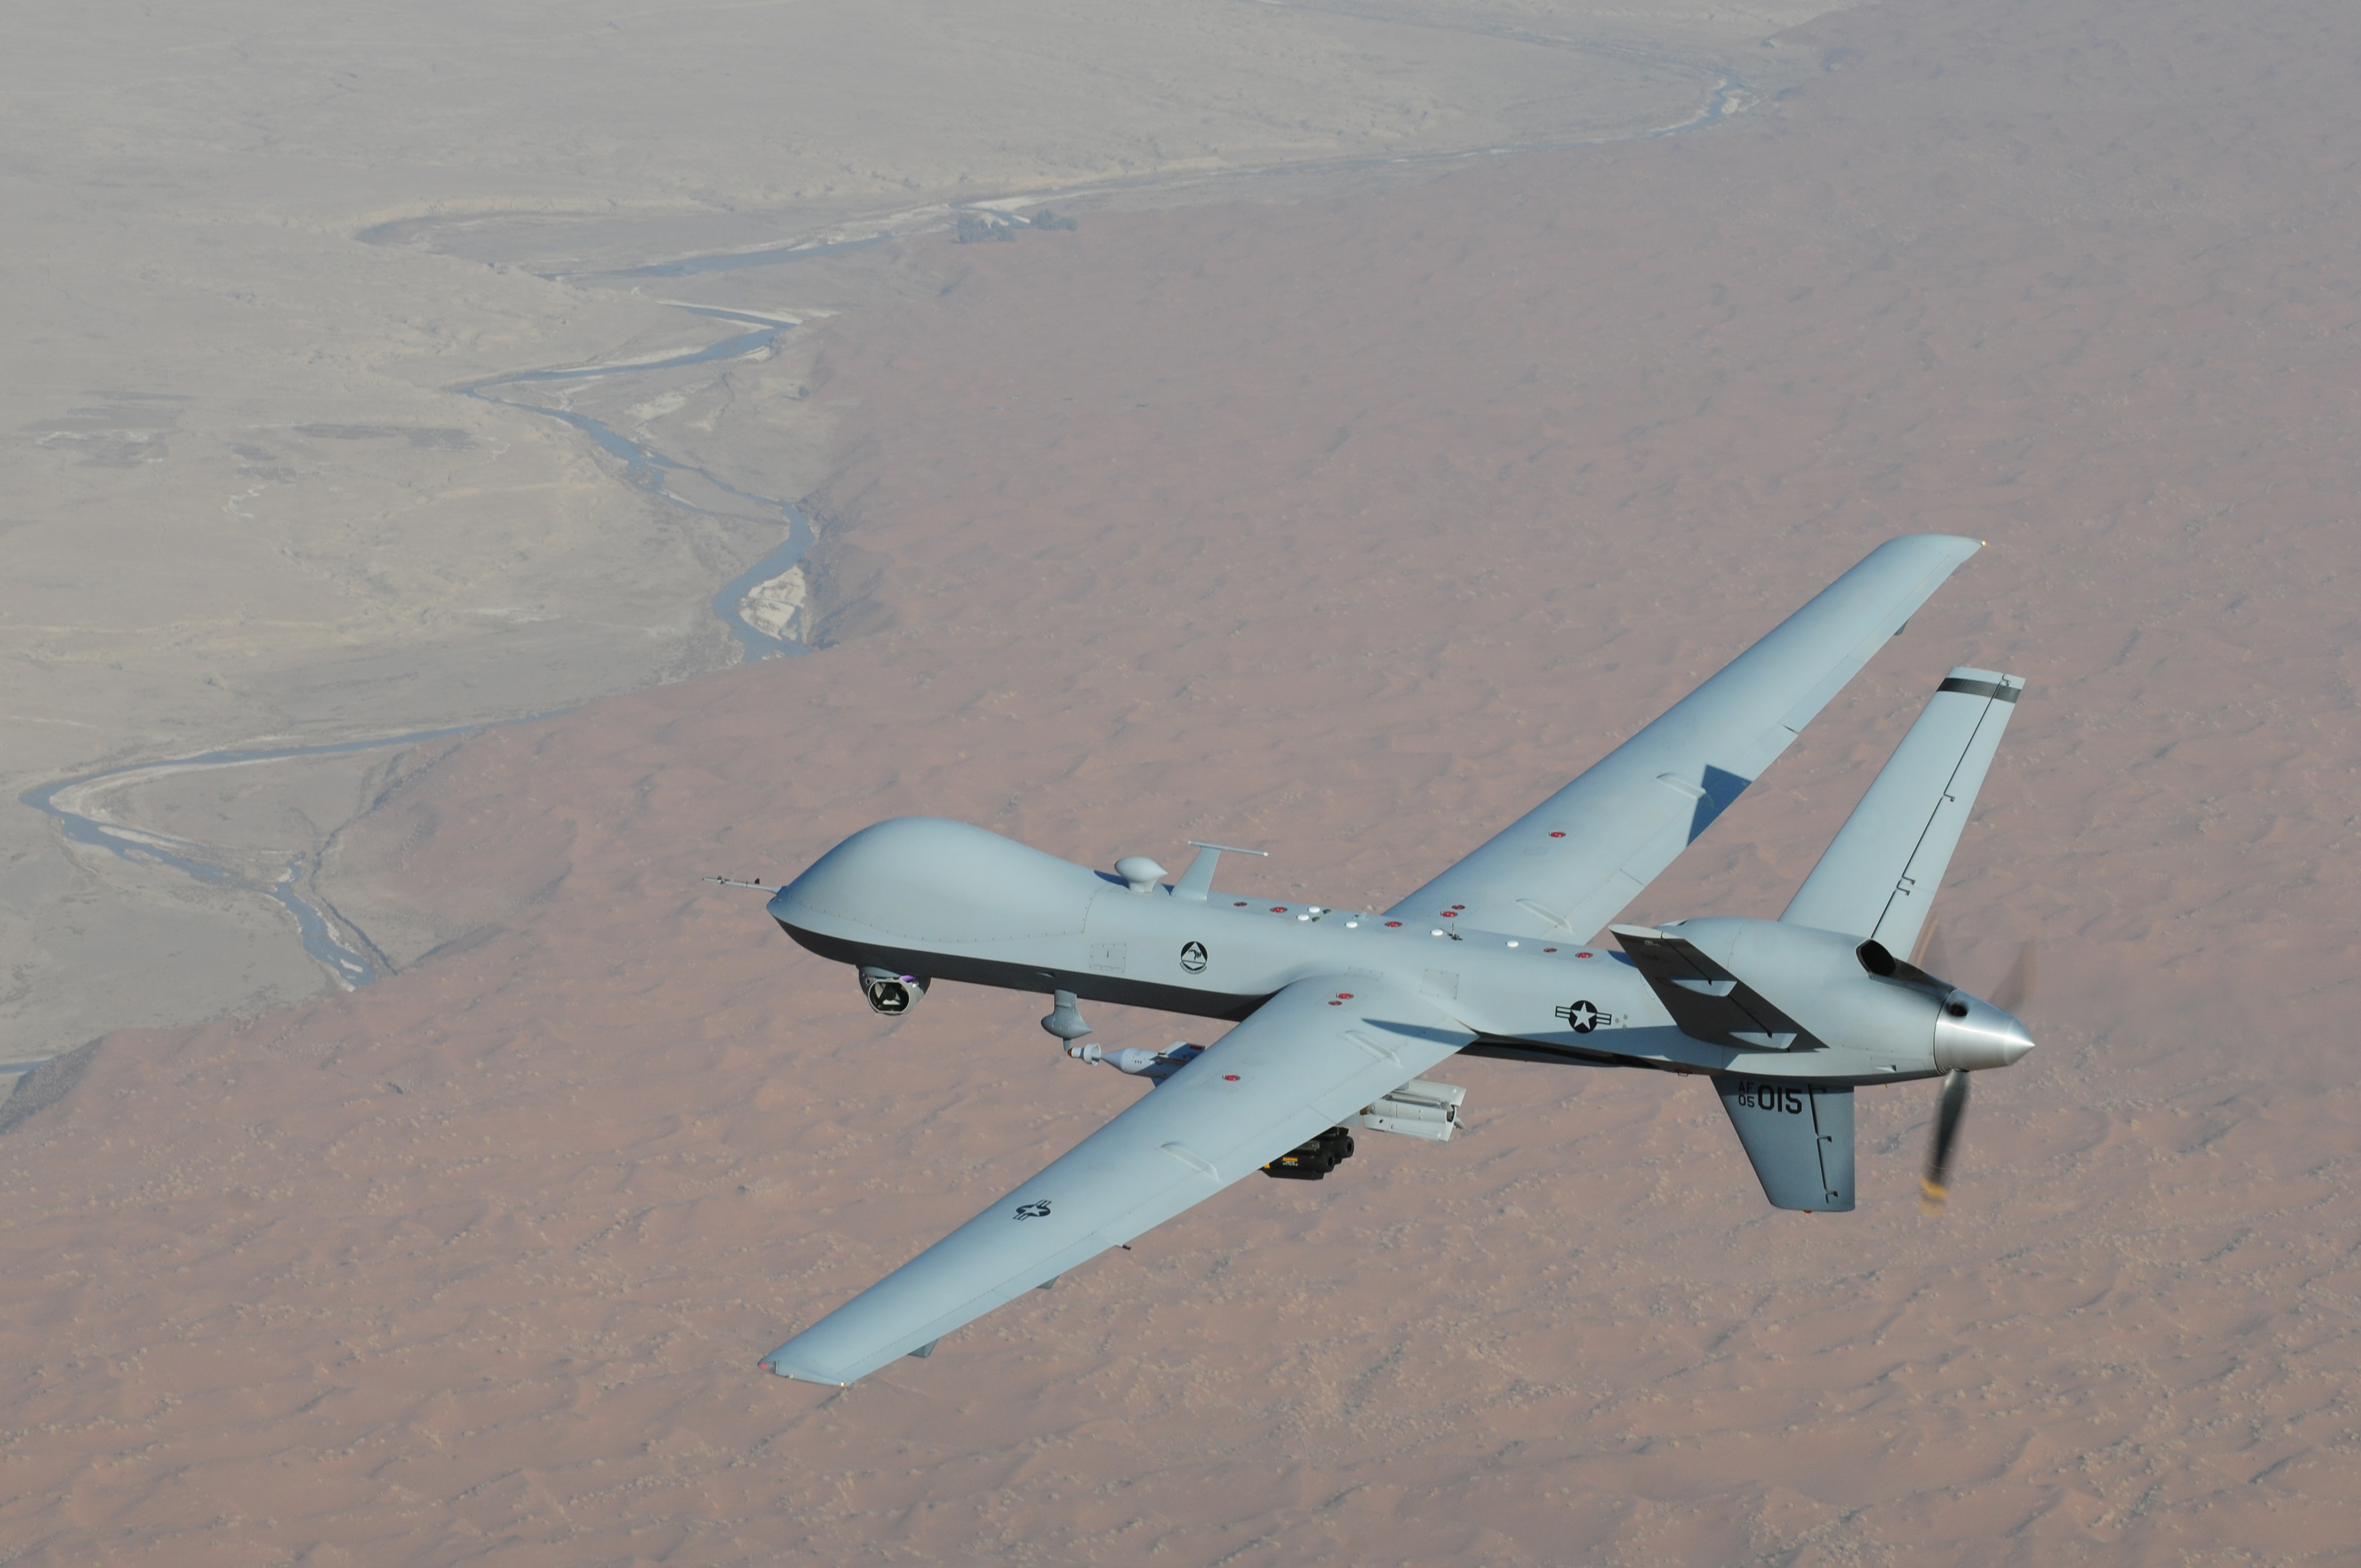 File:MQ-9 Reaper UAV.jpg - Wikimedia Commons